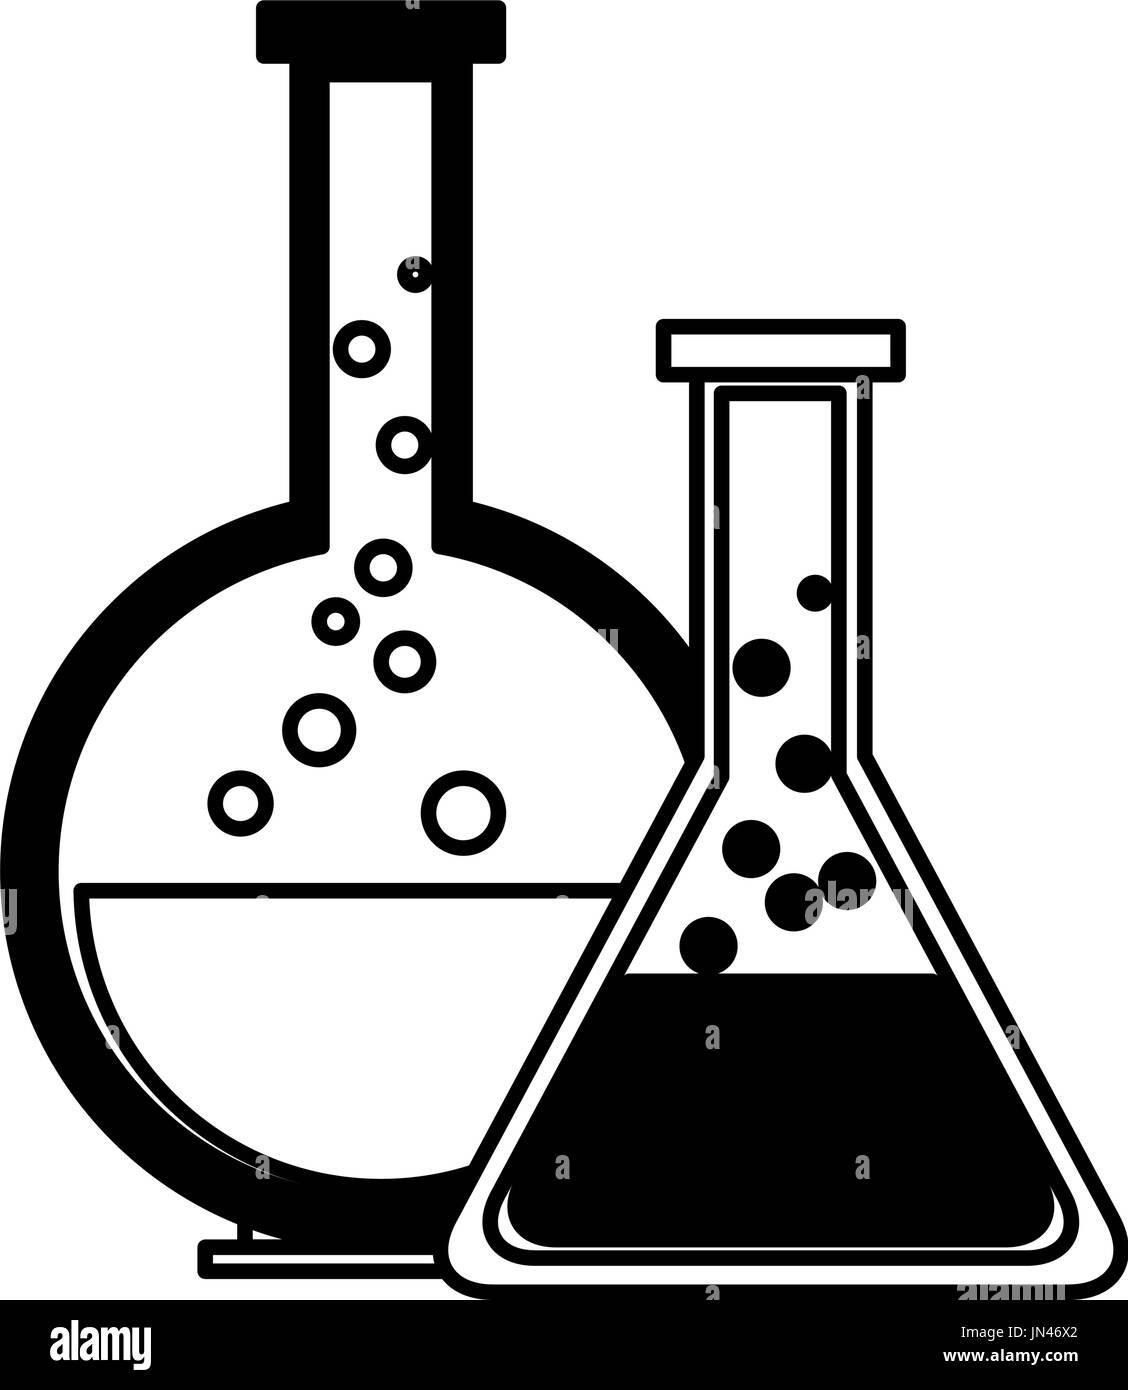 Test Tube Flask Glass Laboratory Equipment School Stock Vector Art Amp Illustration Vector Image